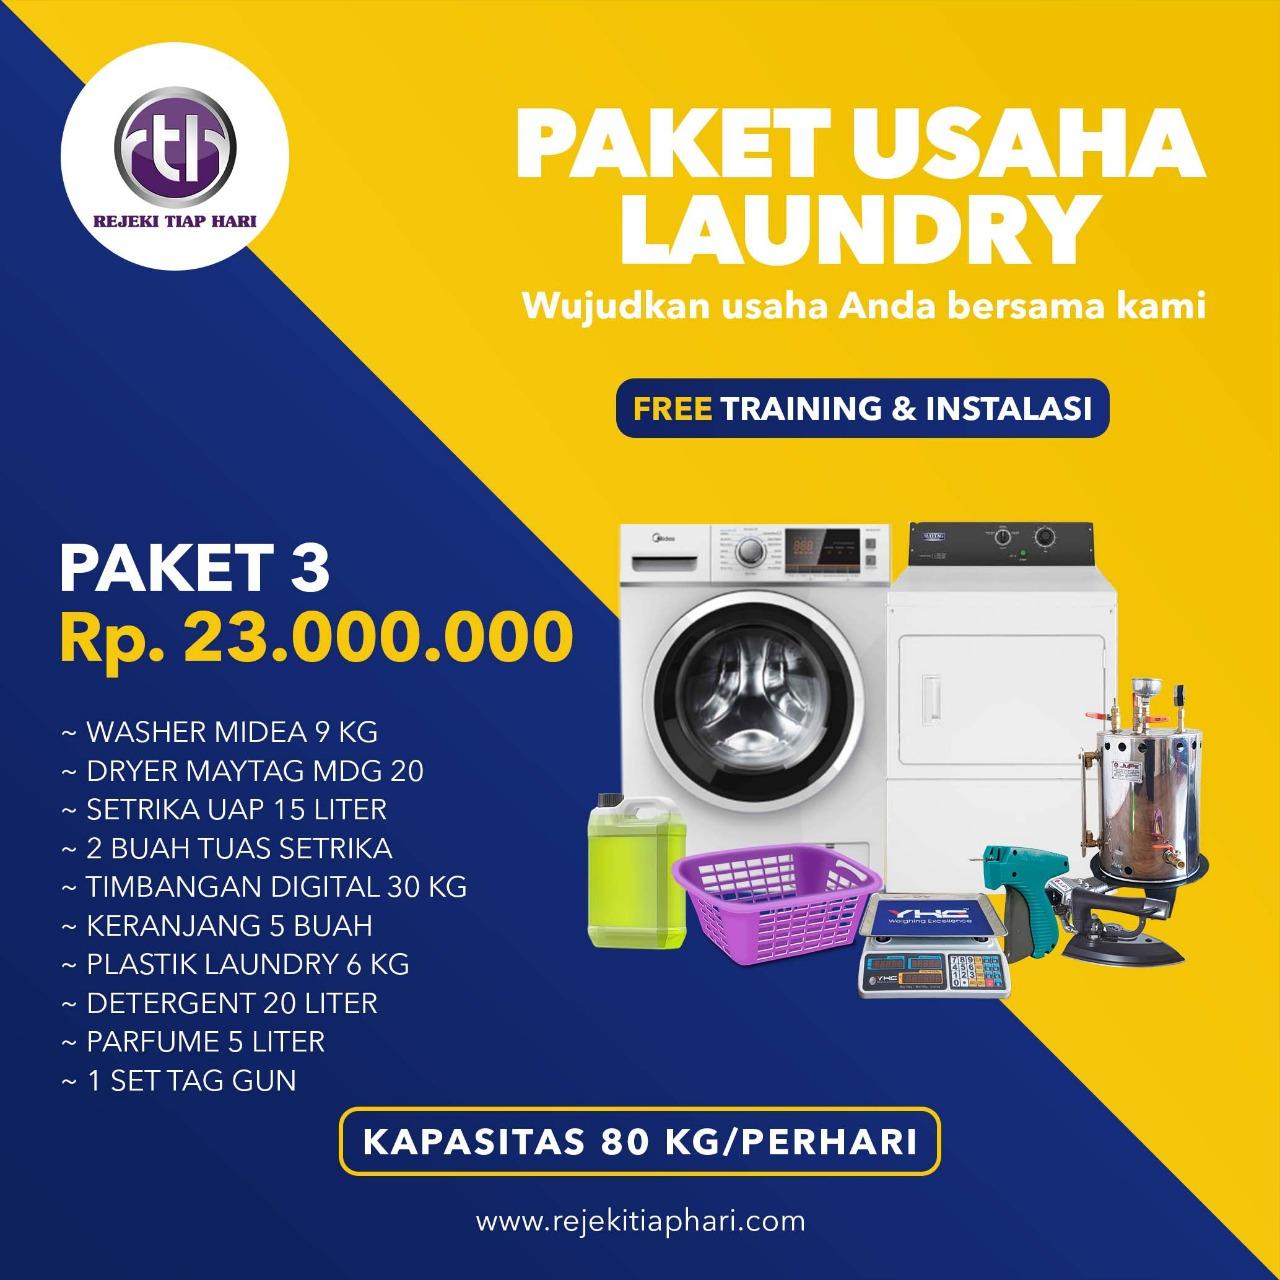 Paket Usaha Laundry Kiloan